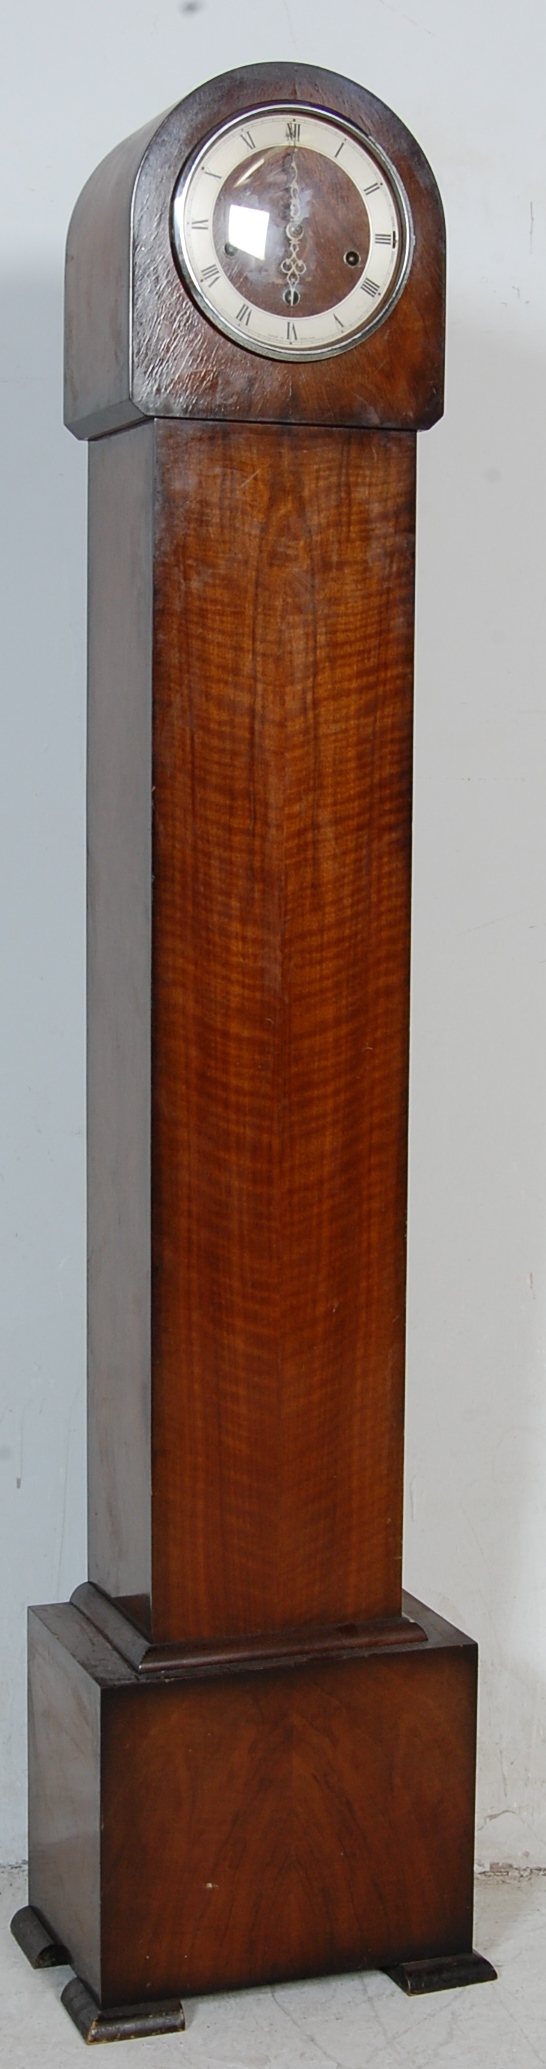 EARLY 20TH CENTURY 1930S WALNUT VENEER 8 DAY GRANDMOTHER CLOCK